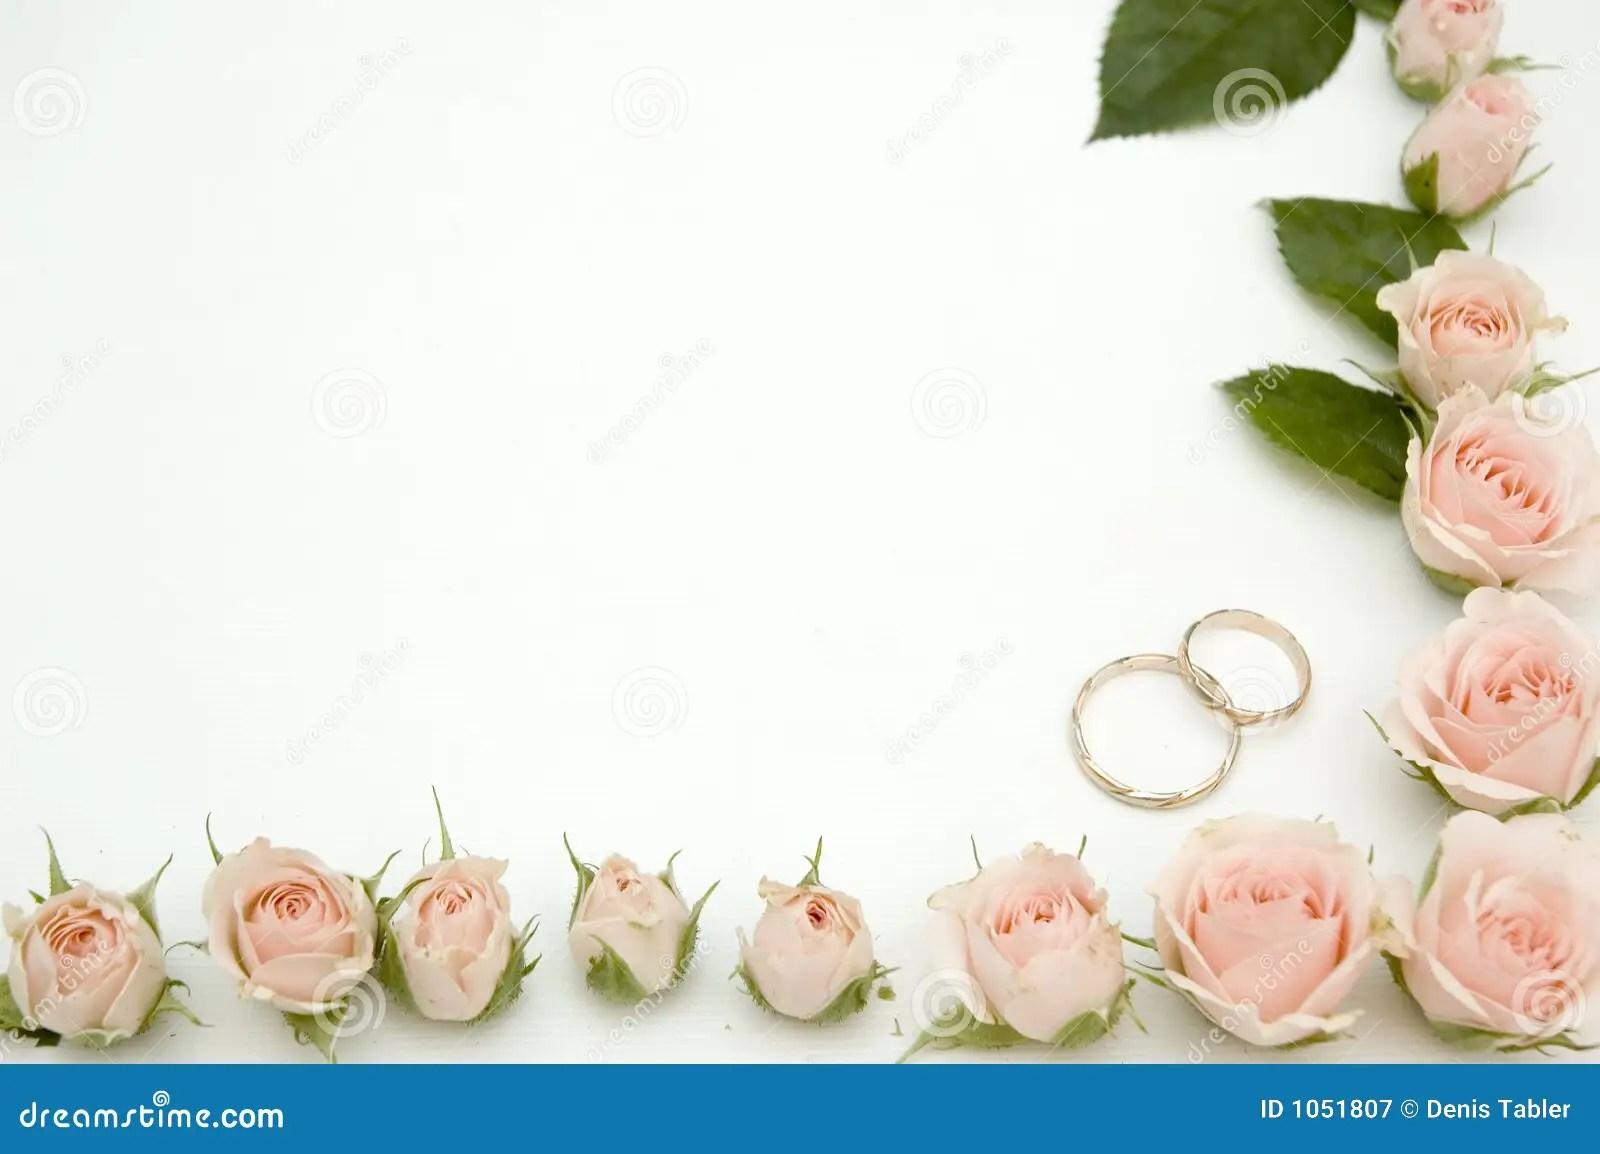 25 creative wedding picture frames picsoicom